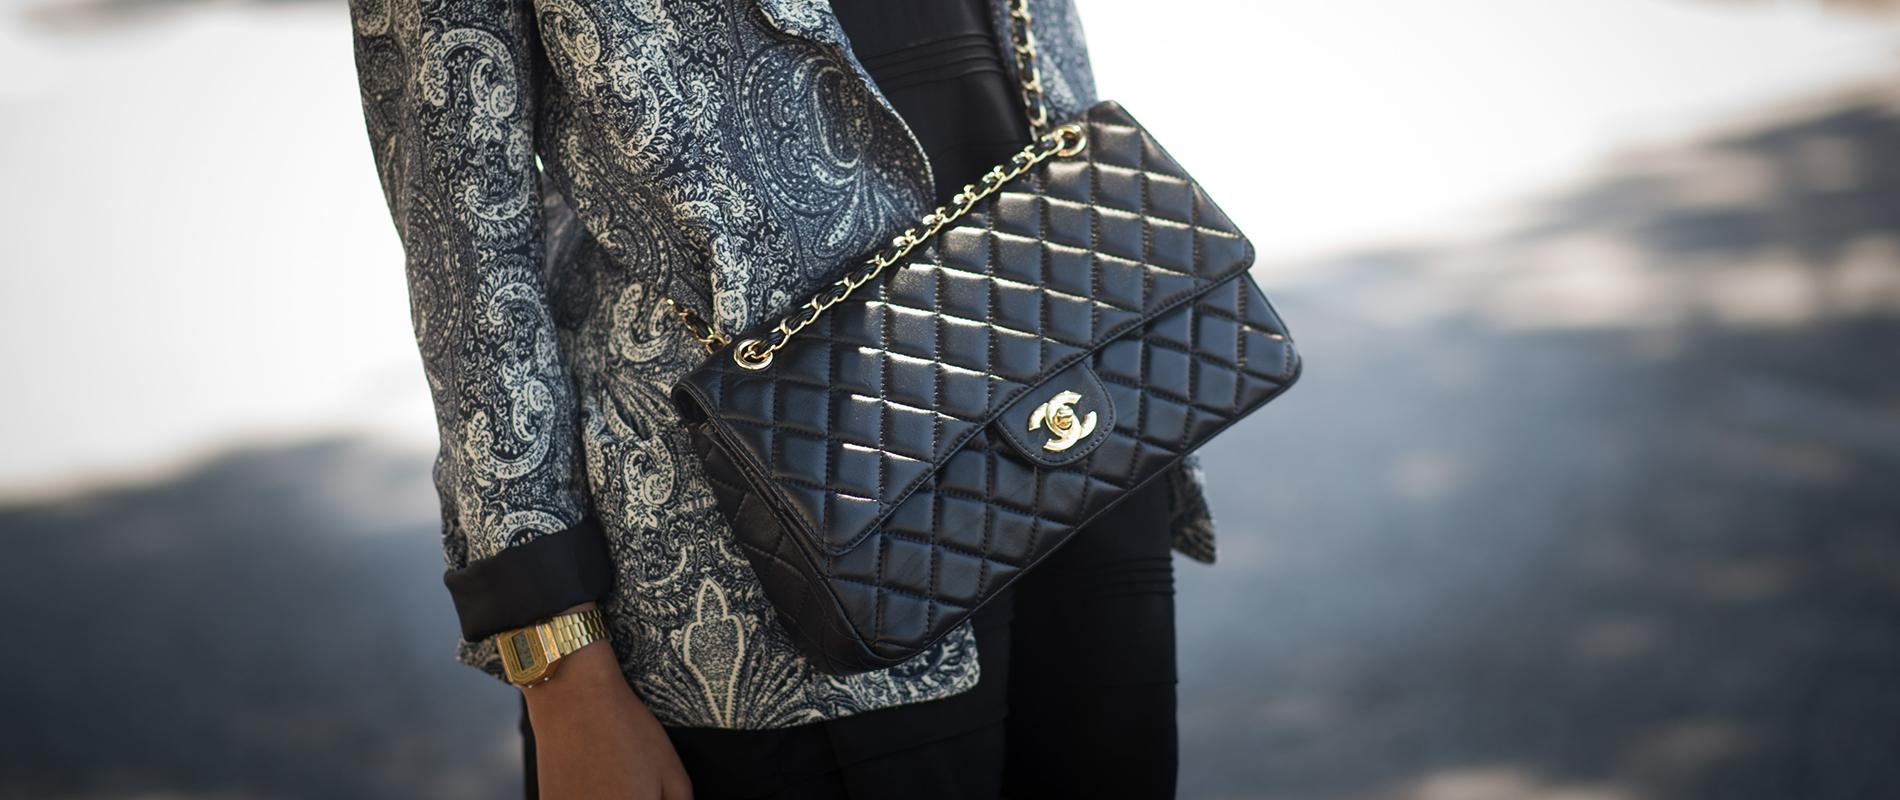 chanel sac classique